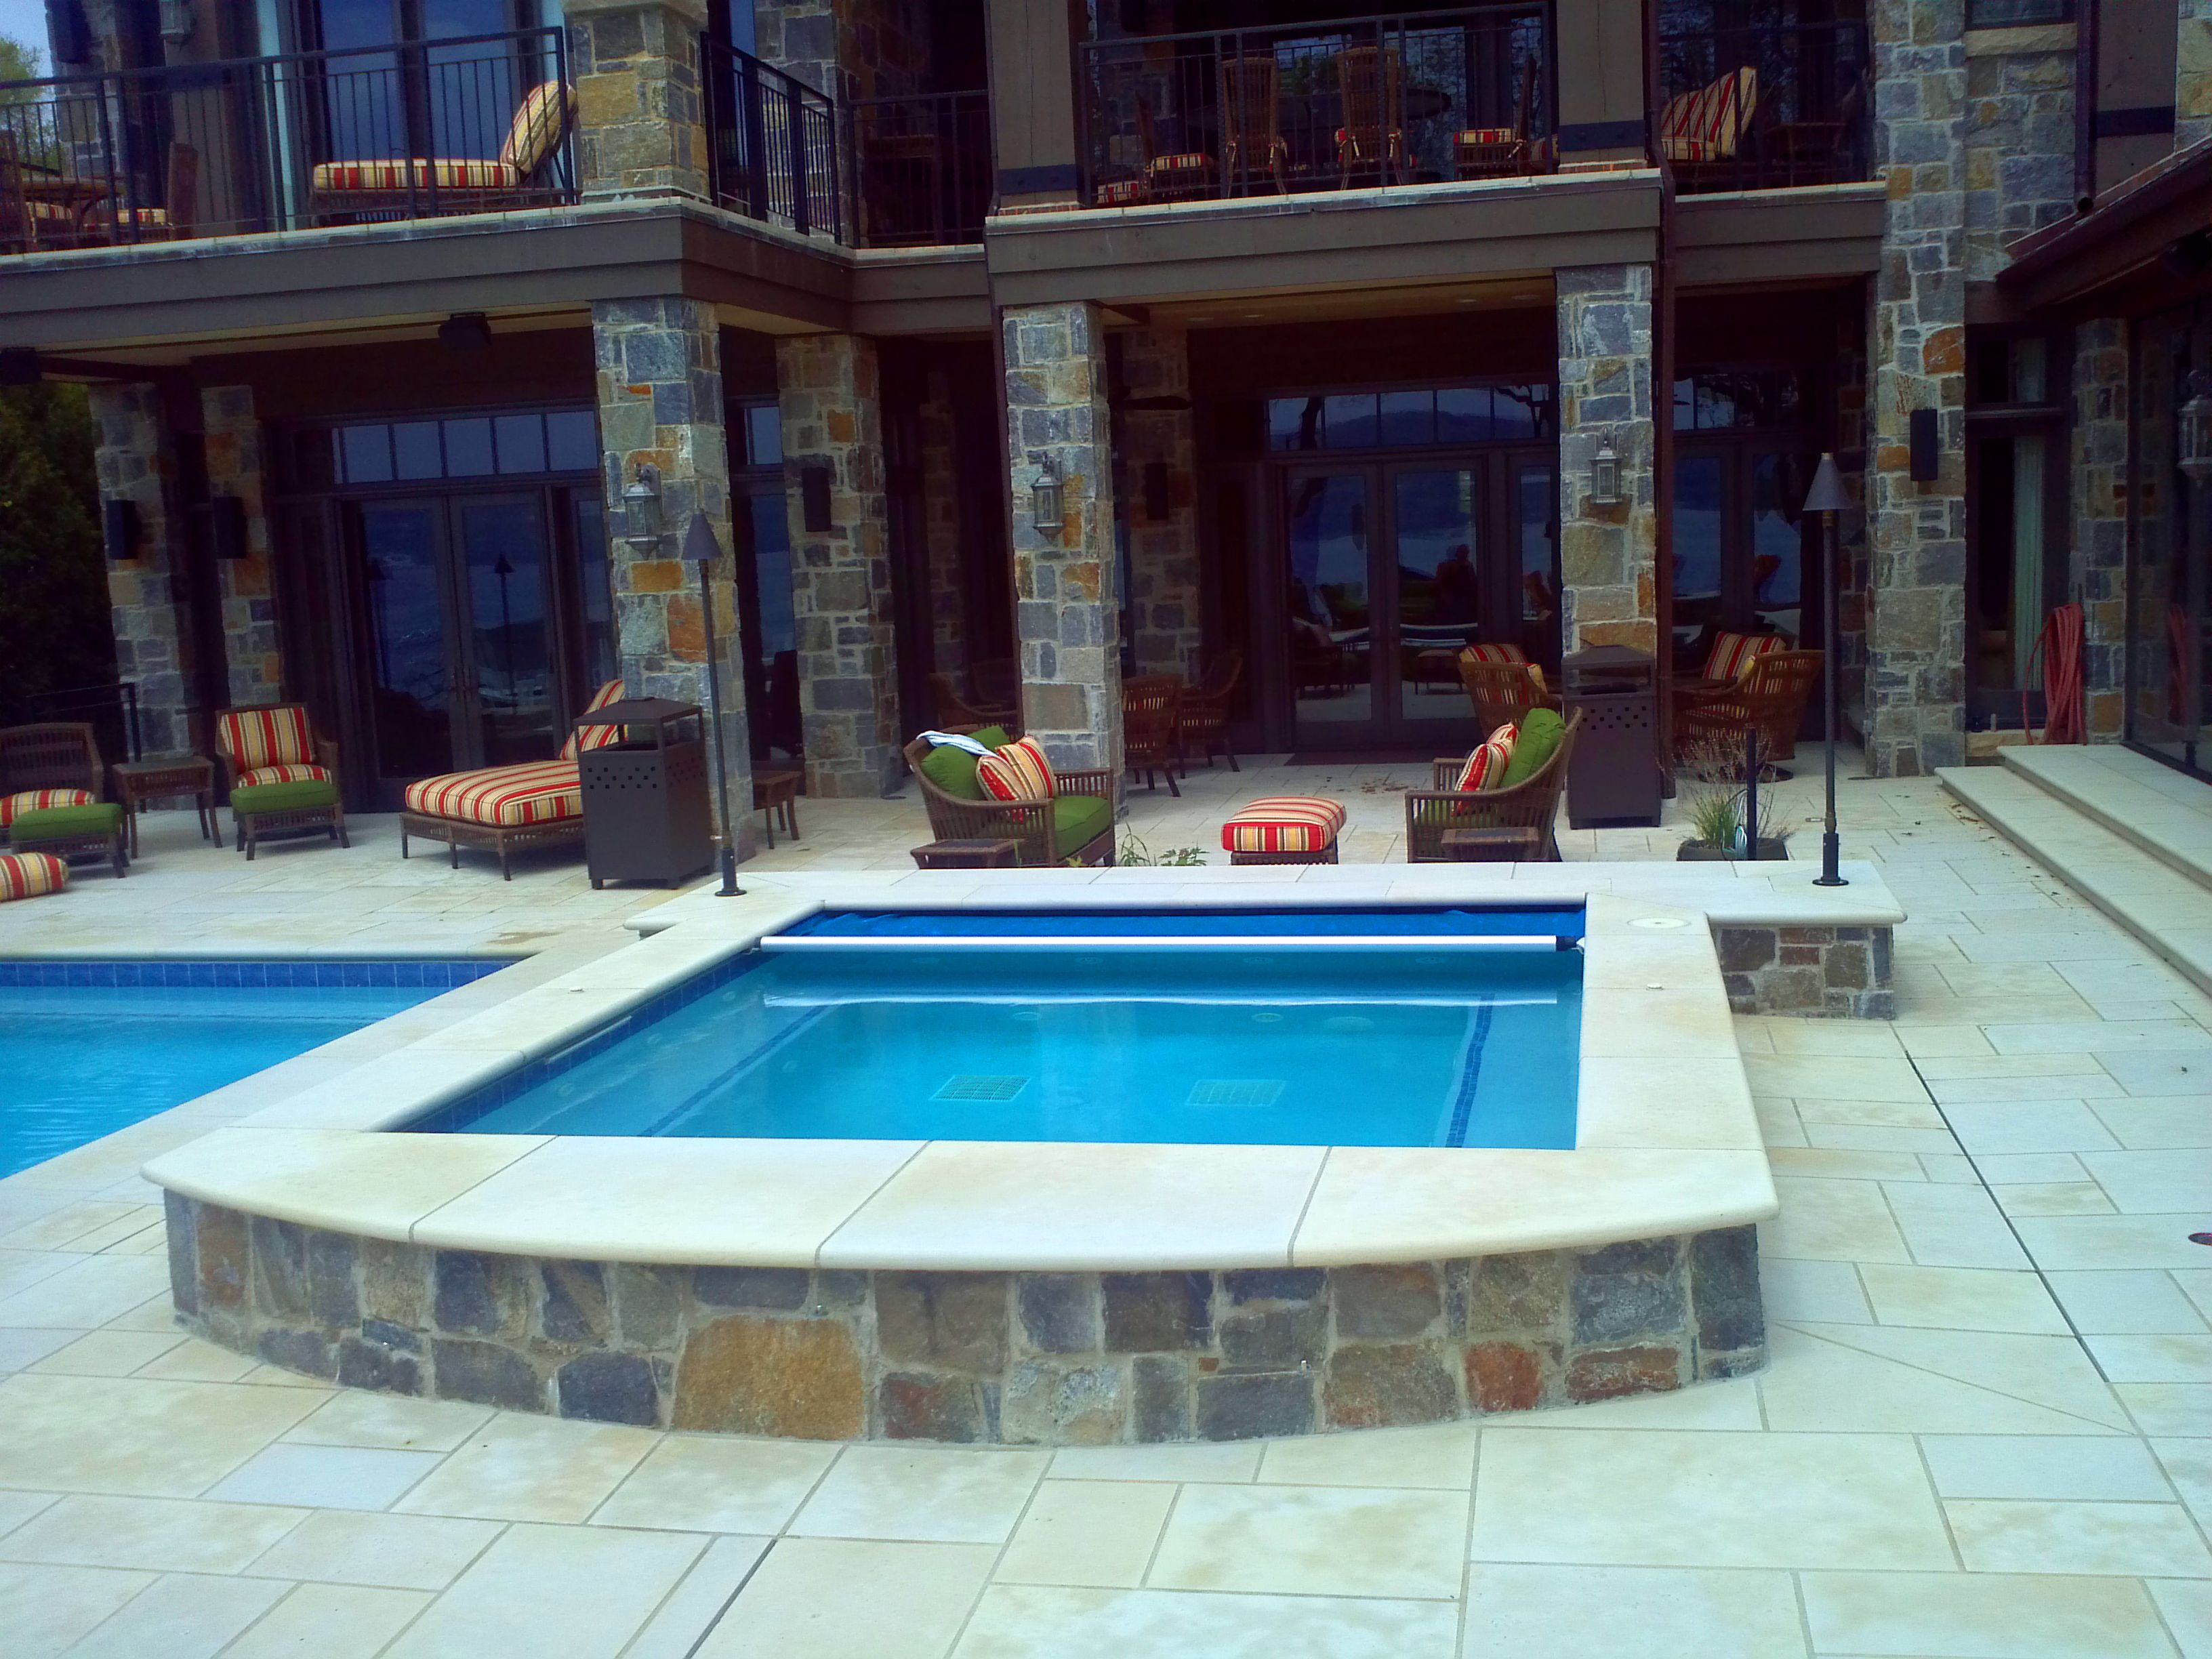 Indoor Swimming Pool Cost | Endless Pool Cost | Fiberglass ...